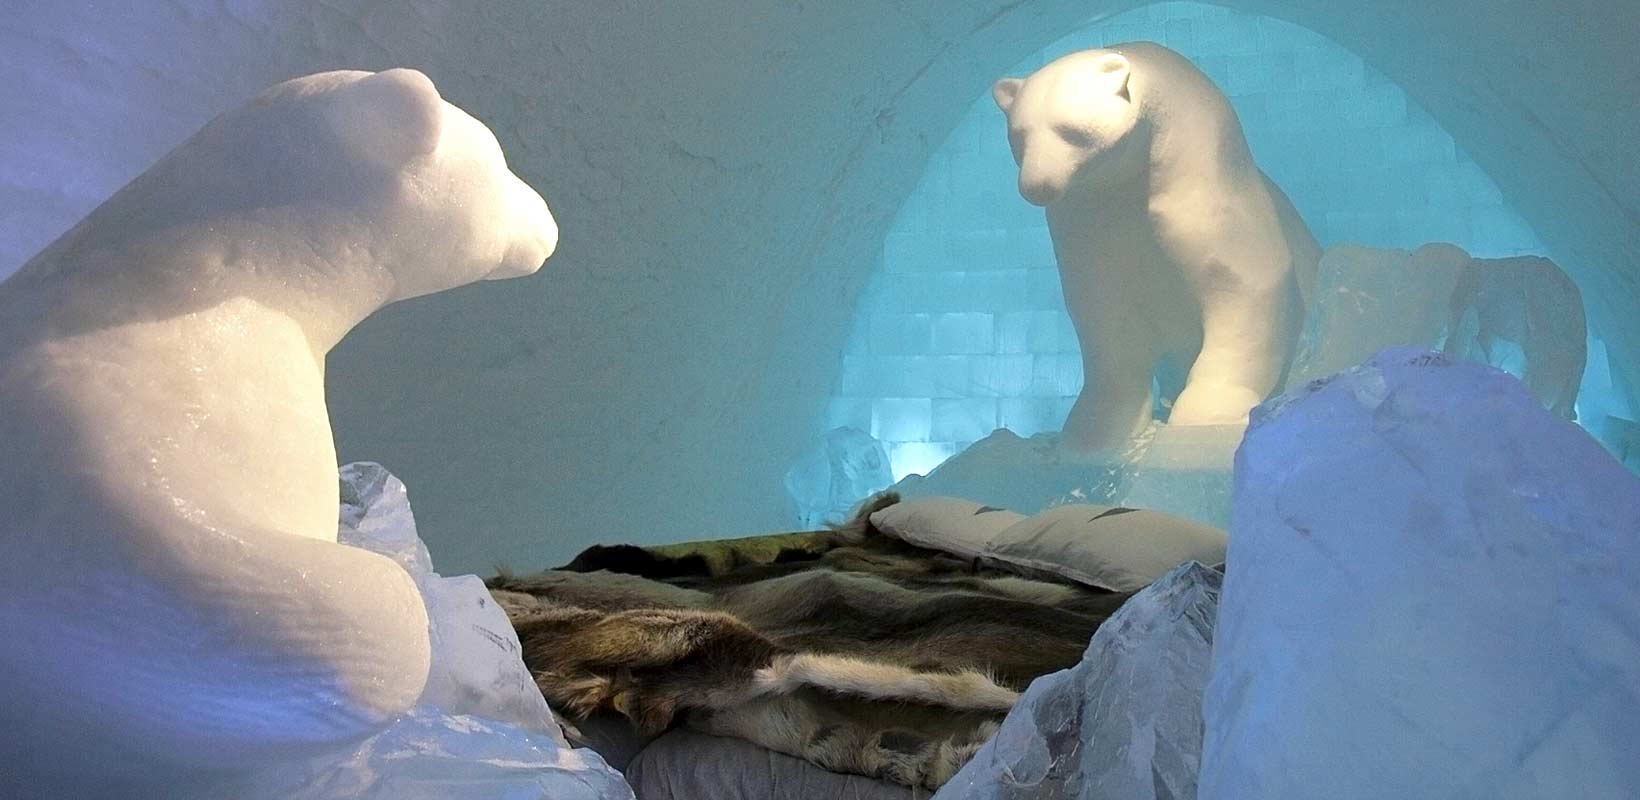 Ice hotel Polar bear sculpture bed